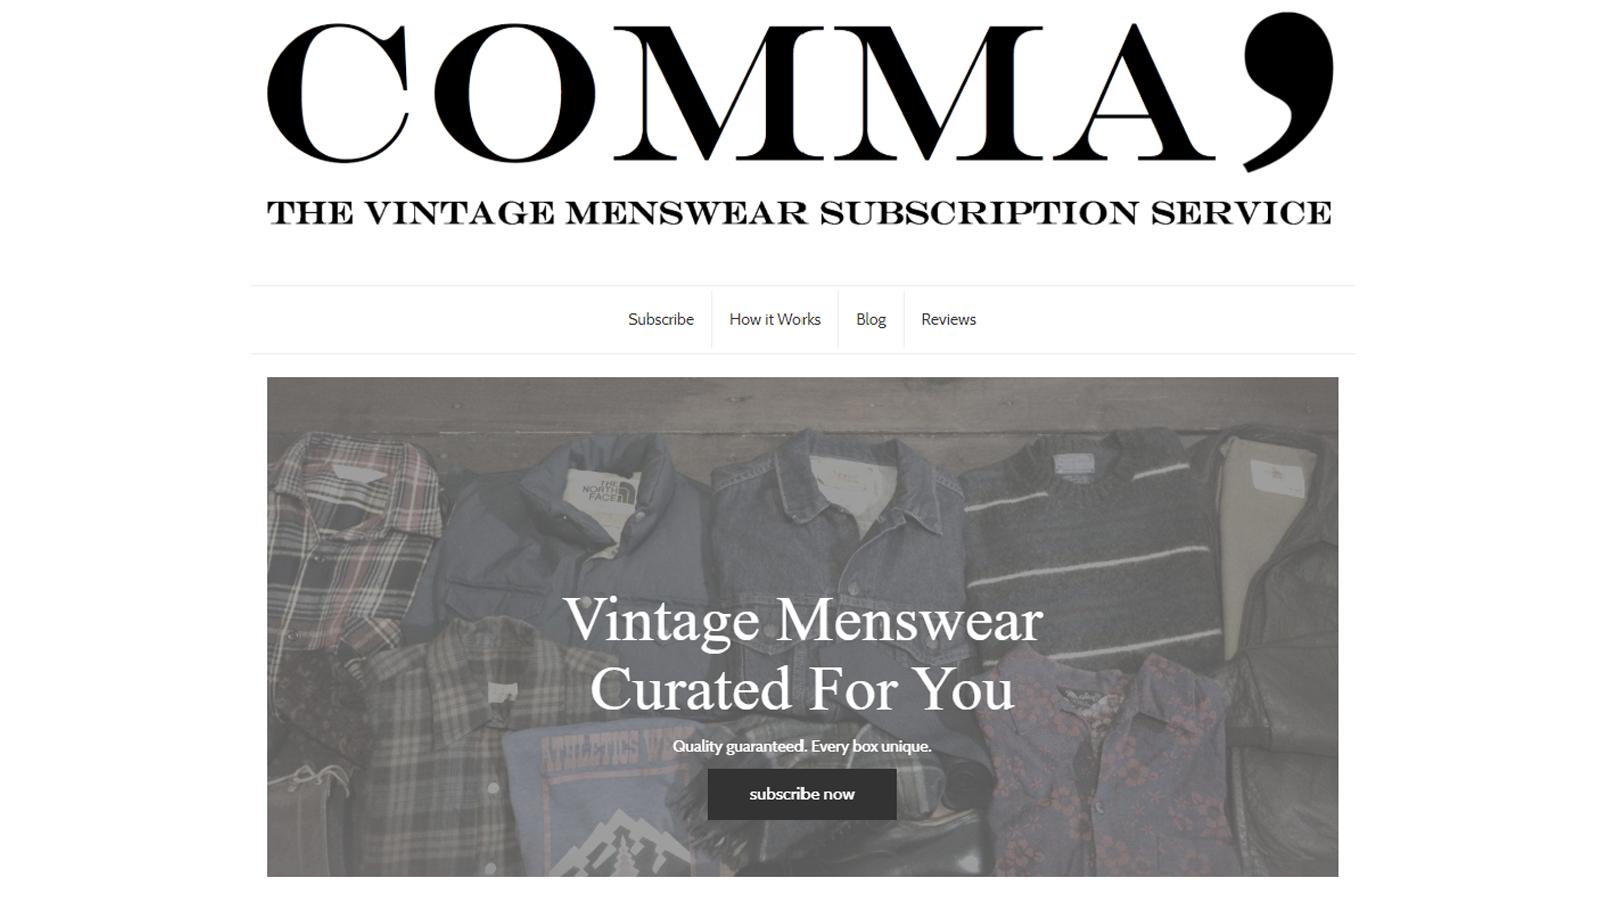 Comma best vintage menswear clothing subscription box unique authentic American vintage finds